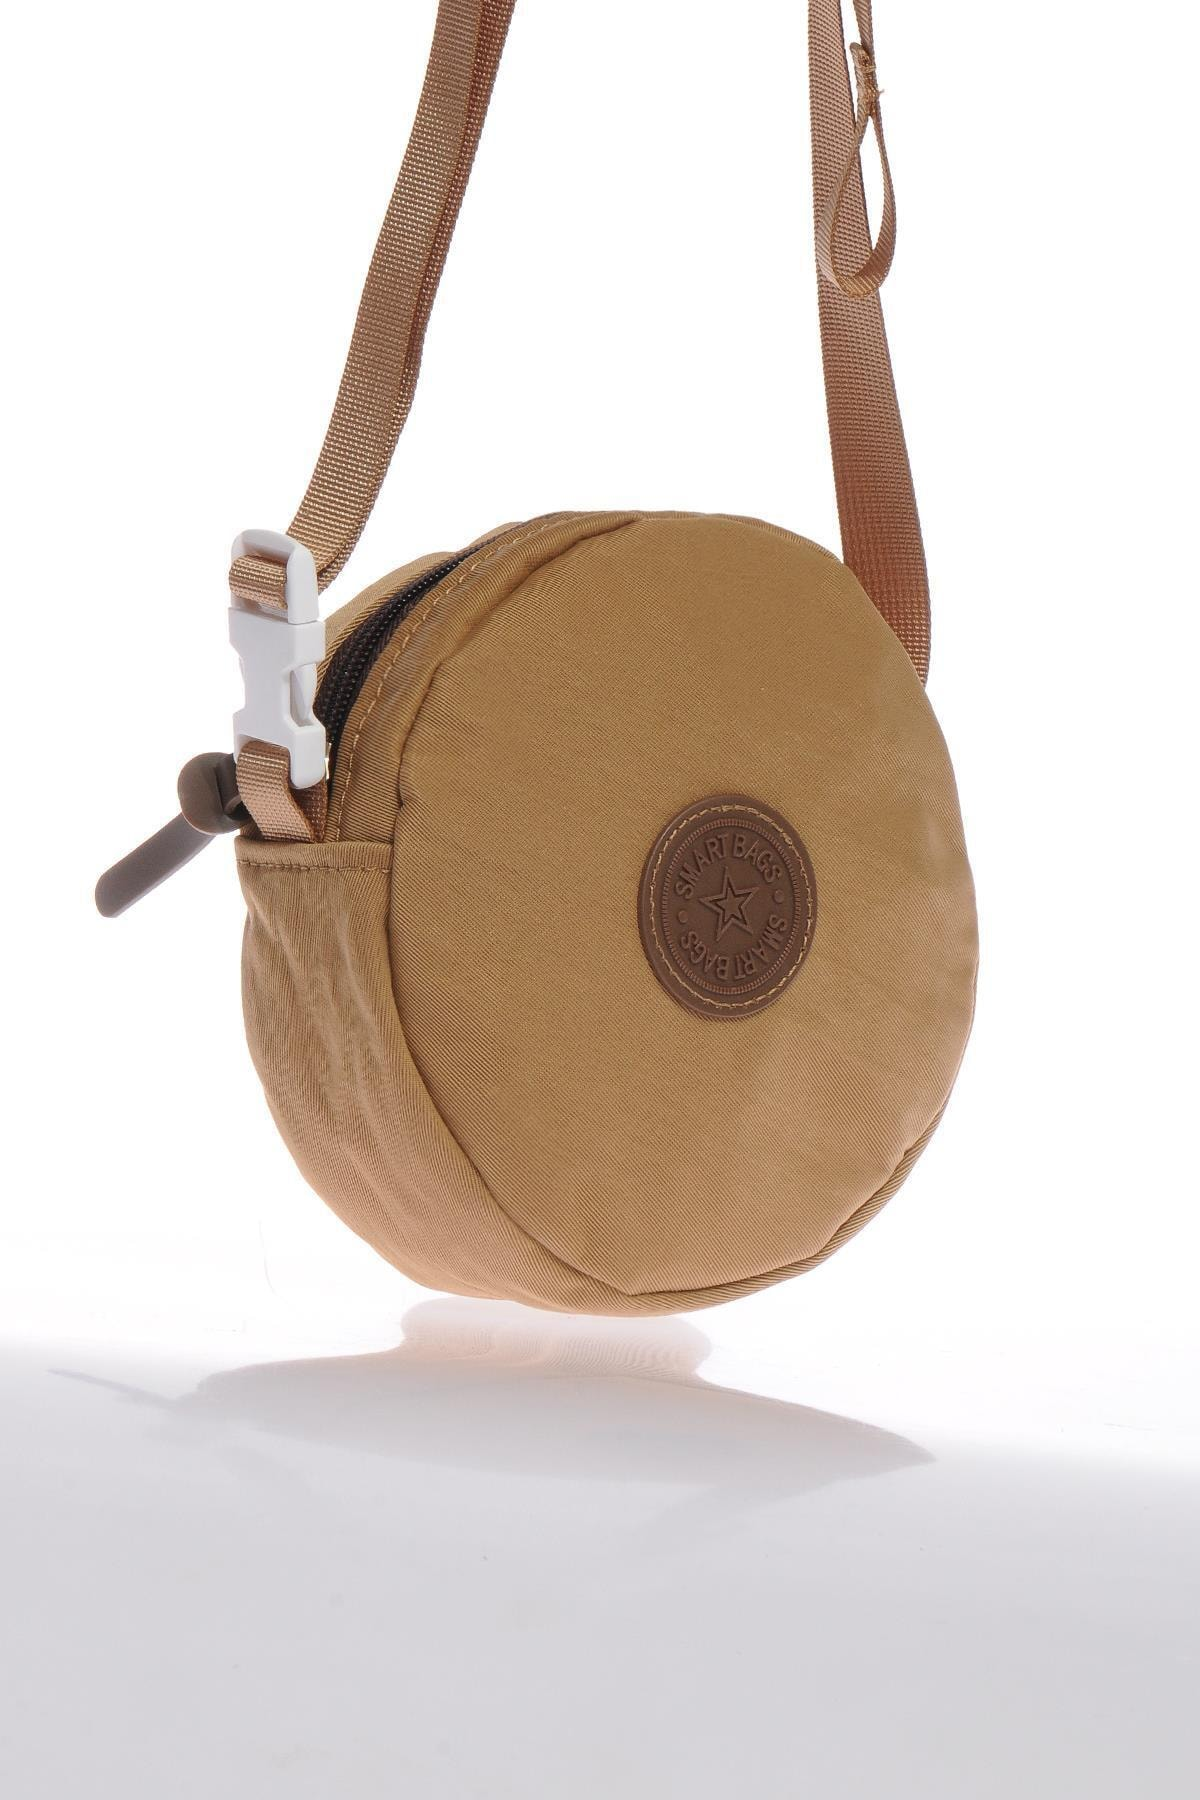 SMART BAGS Smb6001-0110 Taba Kadın Minik Çapraz Çanta 2